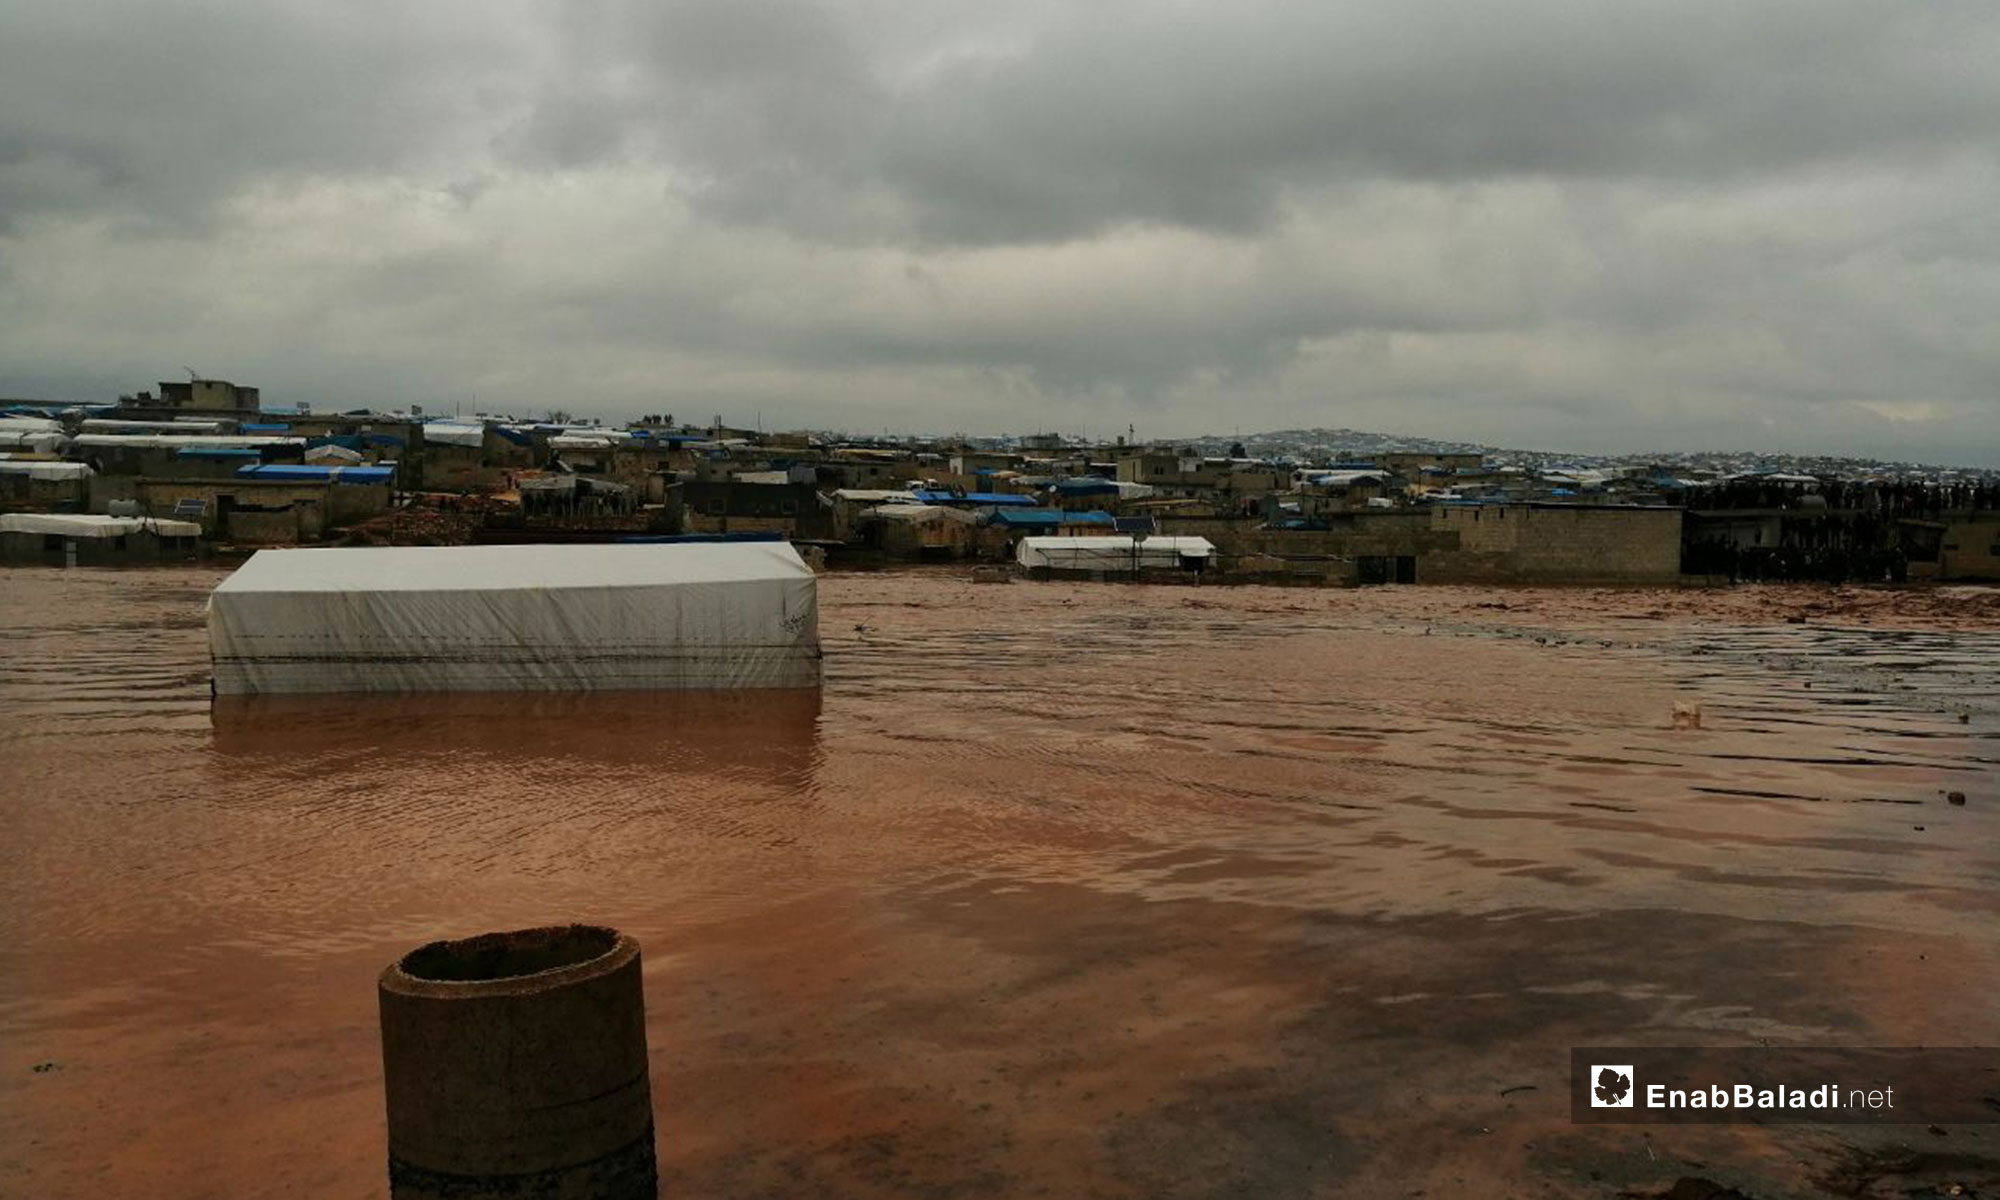 A rainstorm drowns the Atmeh camps, rural Idlib - December 27, 2018 (Enab Baladi)